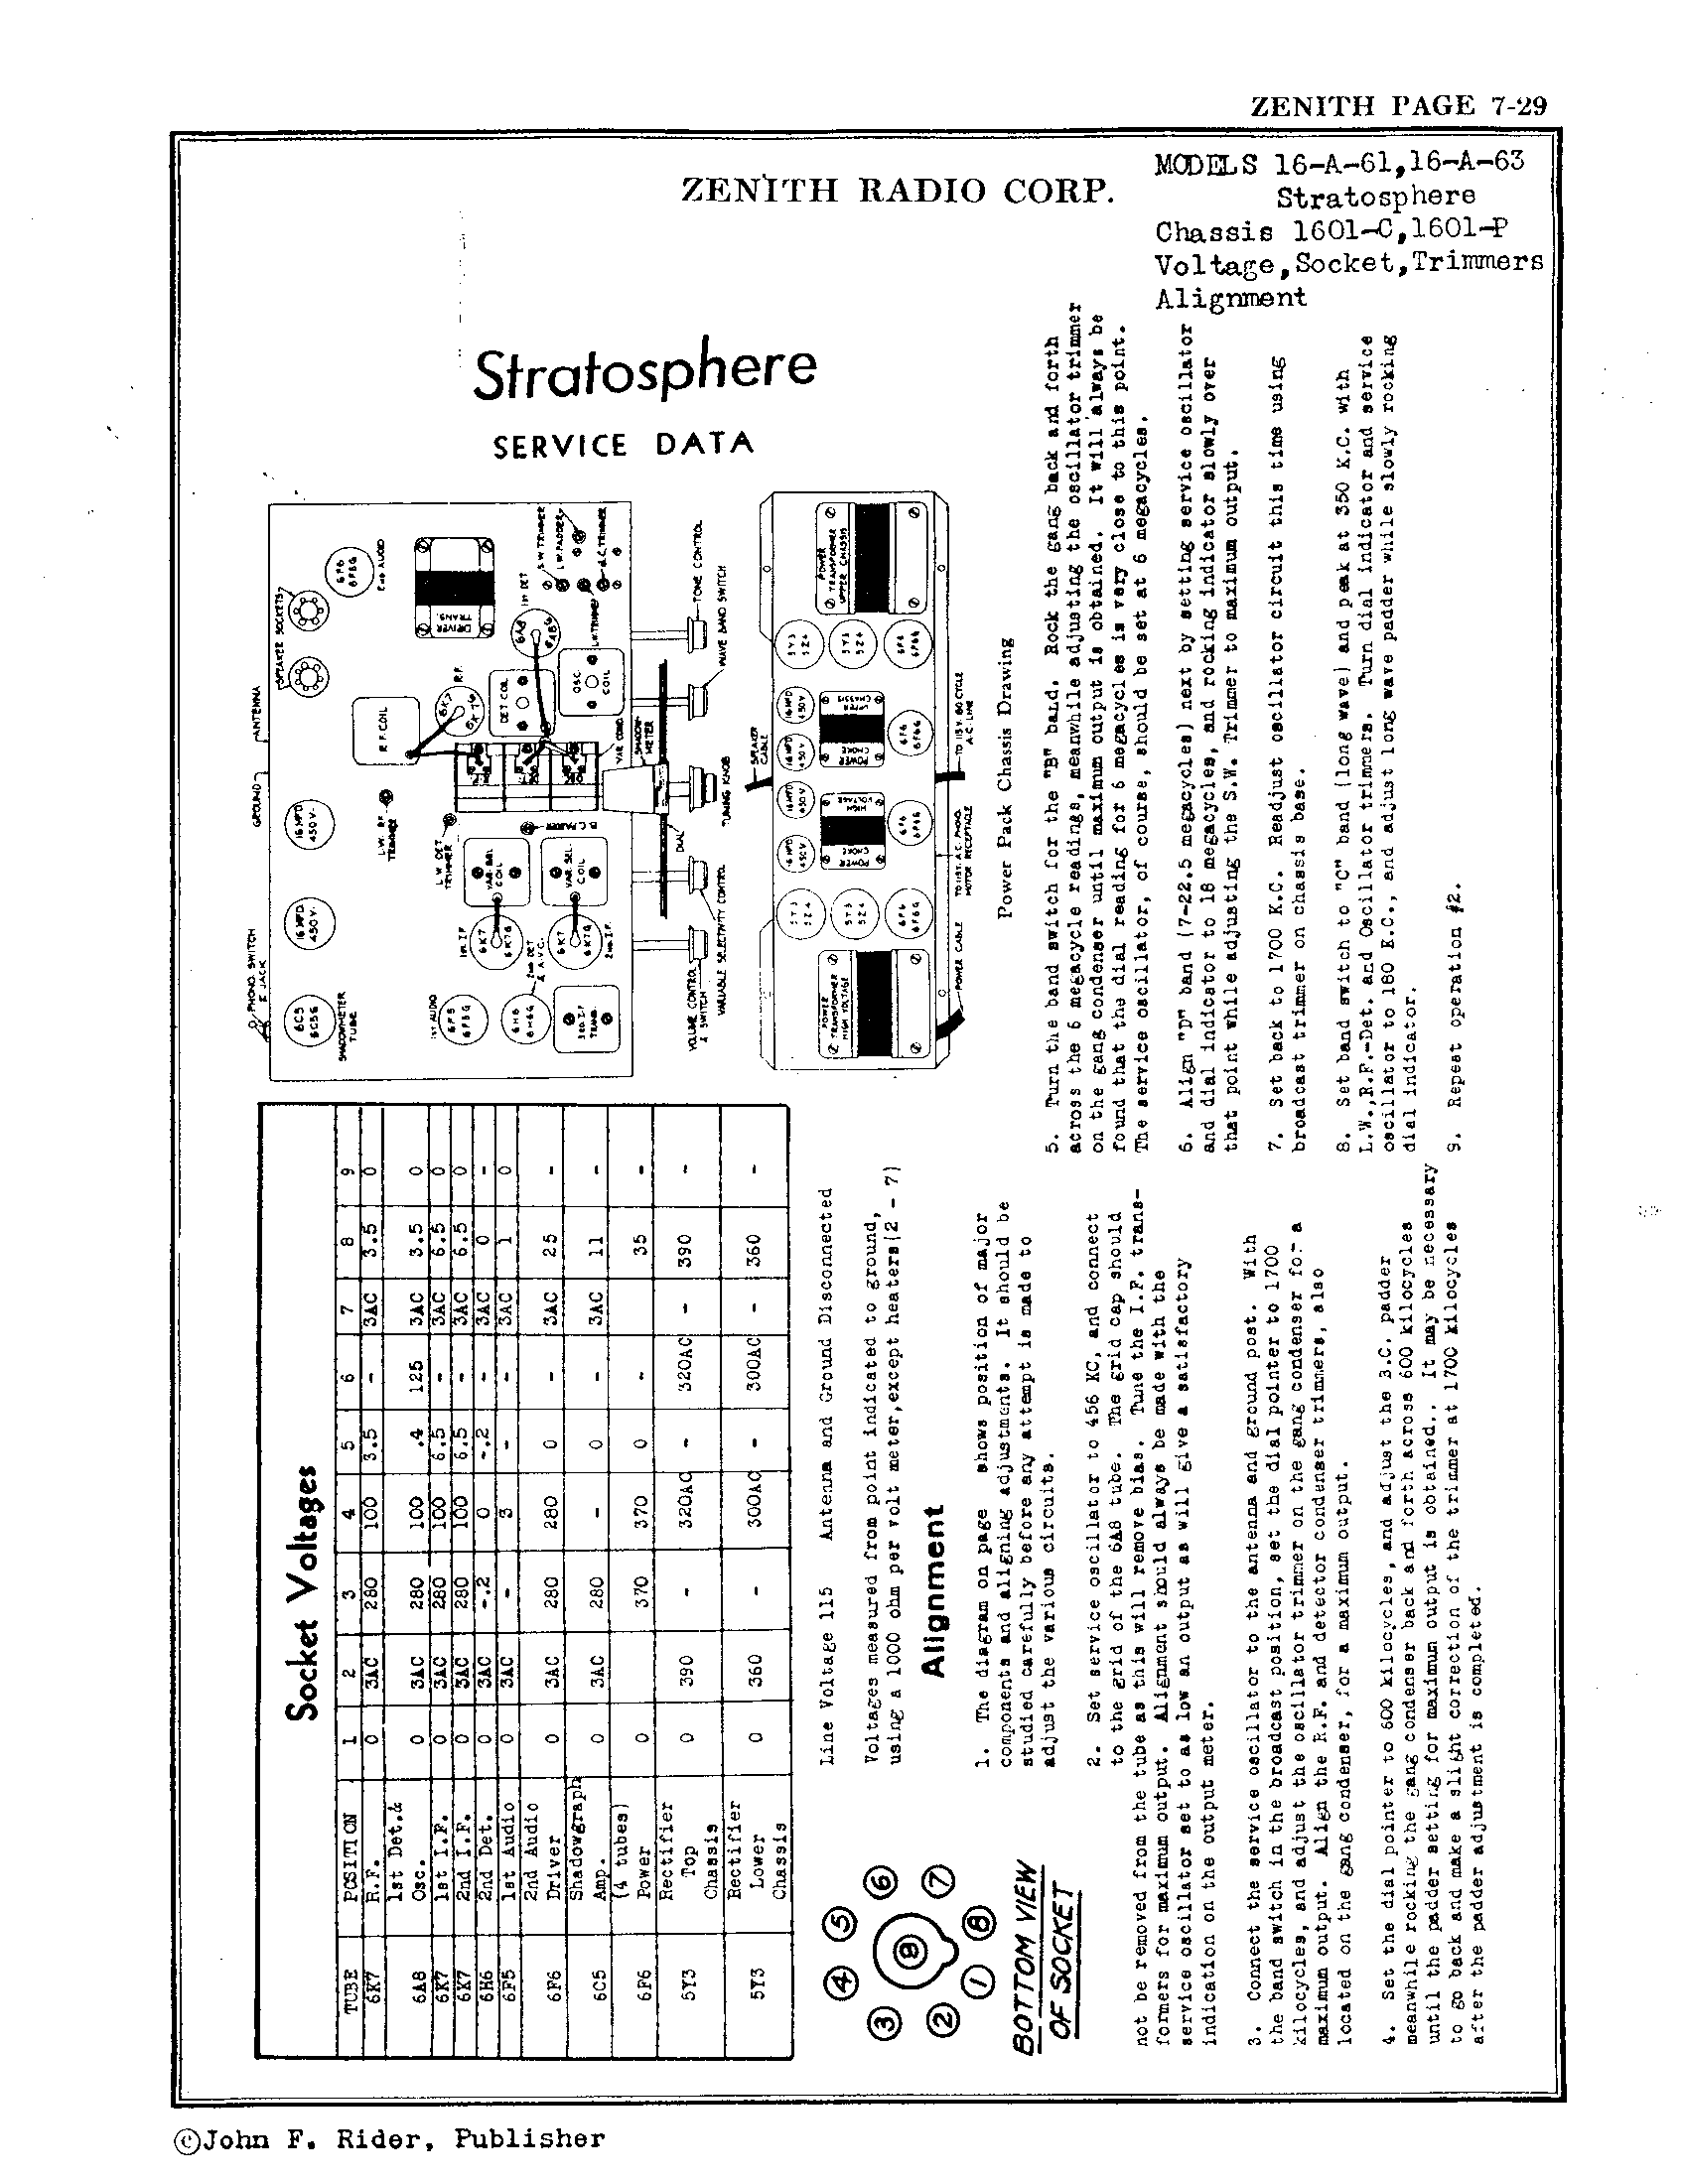 Zenith Radio Corp Stratoshpere Antique Electronic Supply